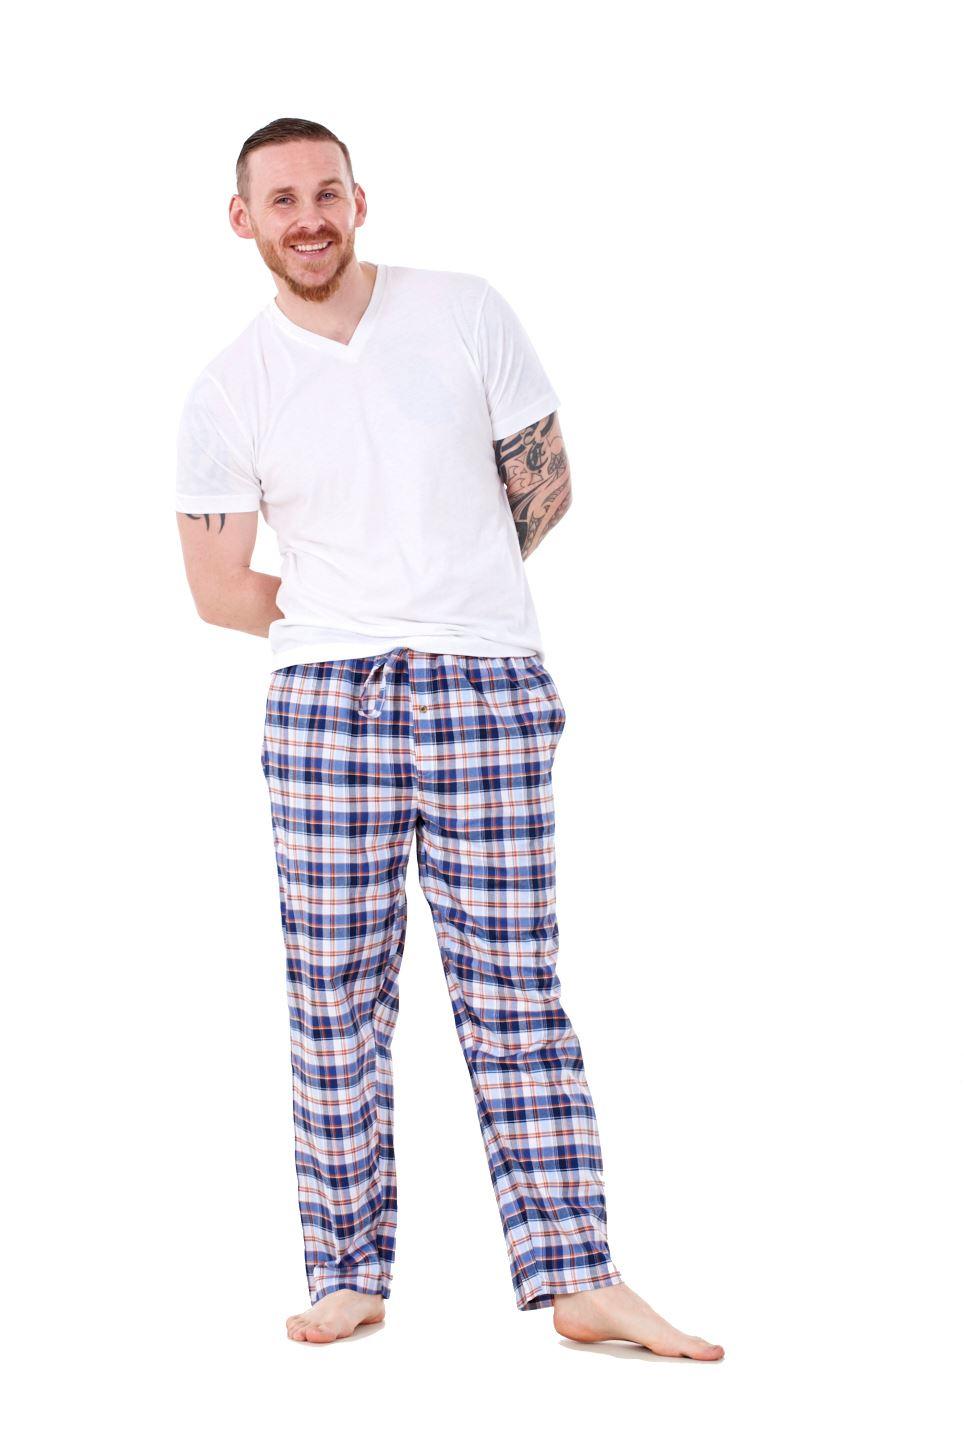 Mens-Pyjama-Bottoms-Rich-Cotton-Woven-Check-Lounge-Pant-Nightwear-Big-3XL-to-5XL Indexbild 16